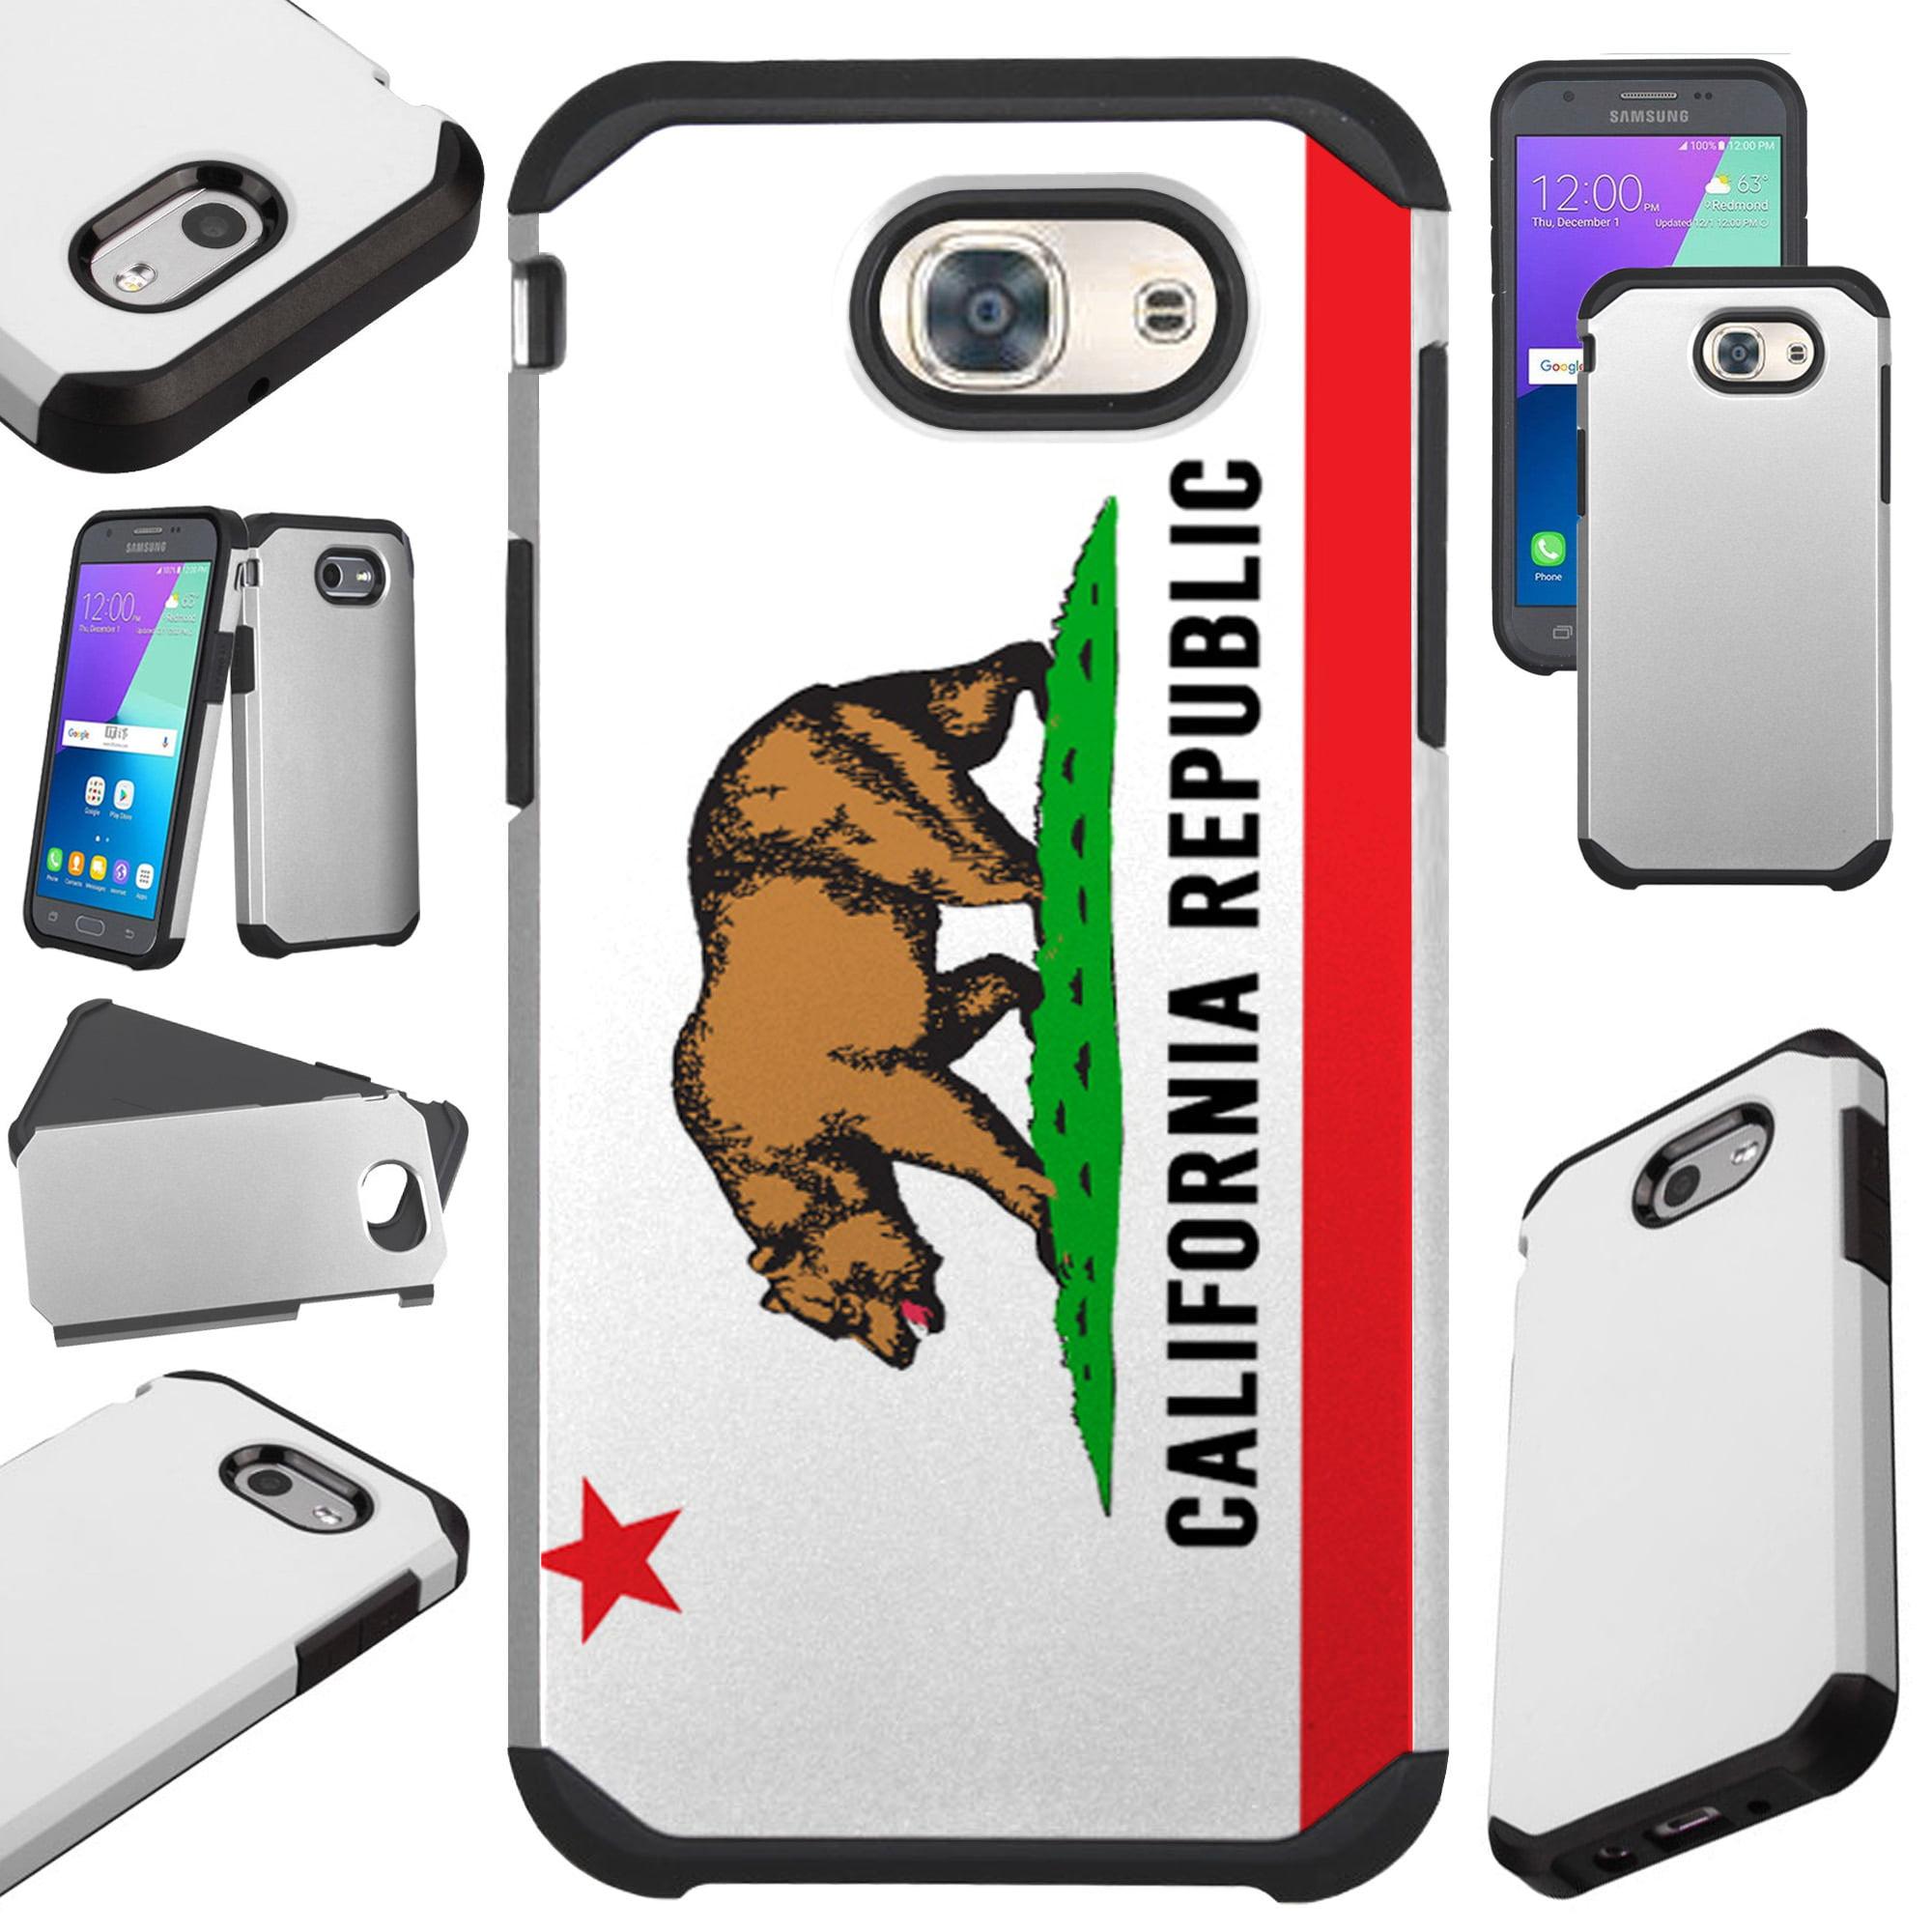 For Samsung Galaxy J3 (2017) / J3 Emerge / J3 Mission / J3 Eclipse / J3 Luna Pro / J3 Prime / Sol 2 / Amp Prime 2 / Express Prime 2 Case Hybrid TPU Fusion Phone Cover (California Flag Wood)